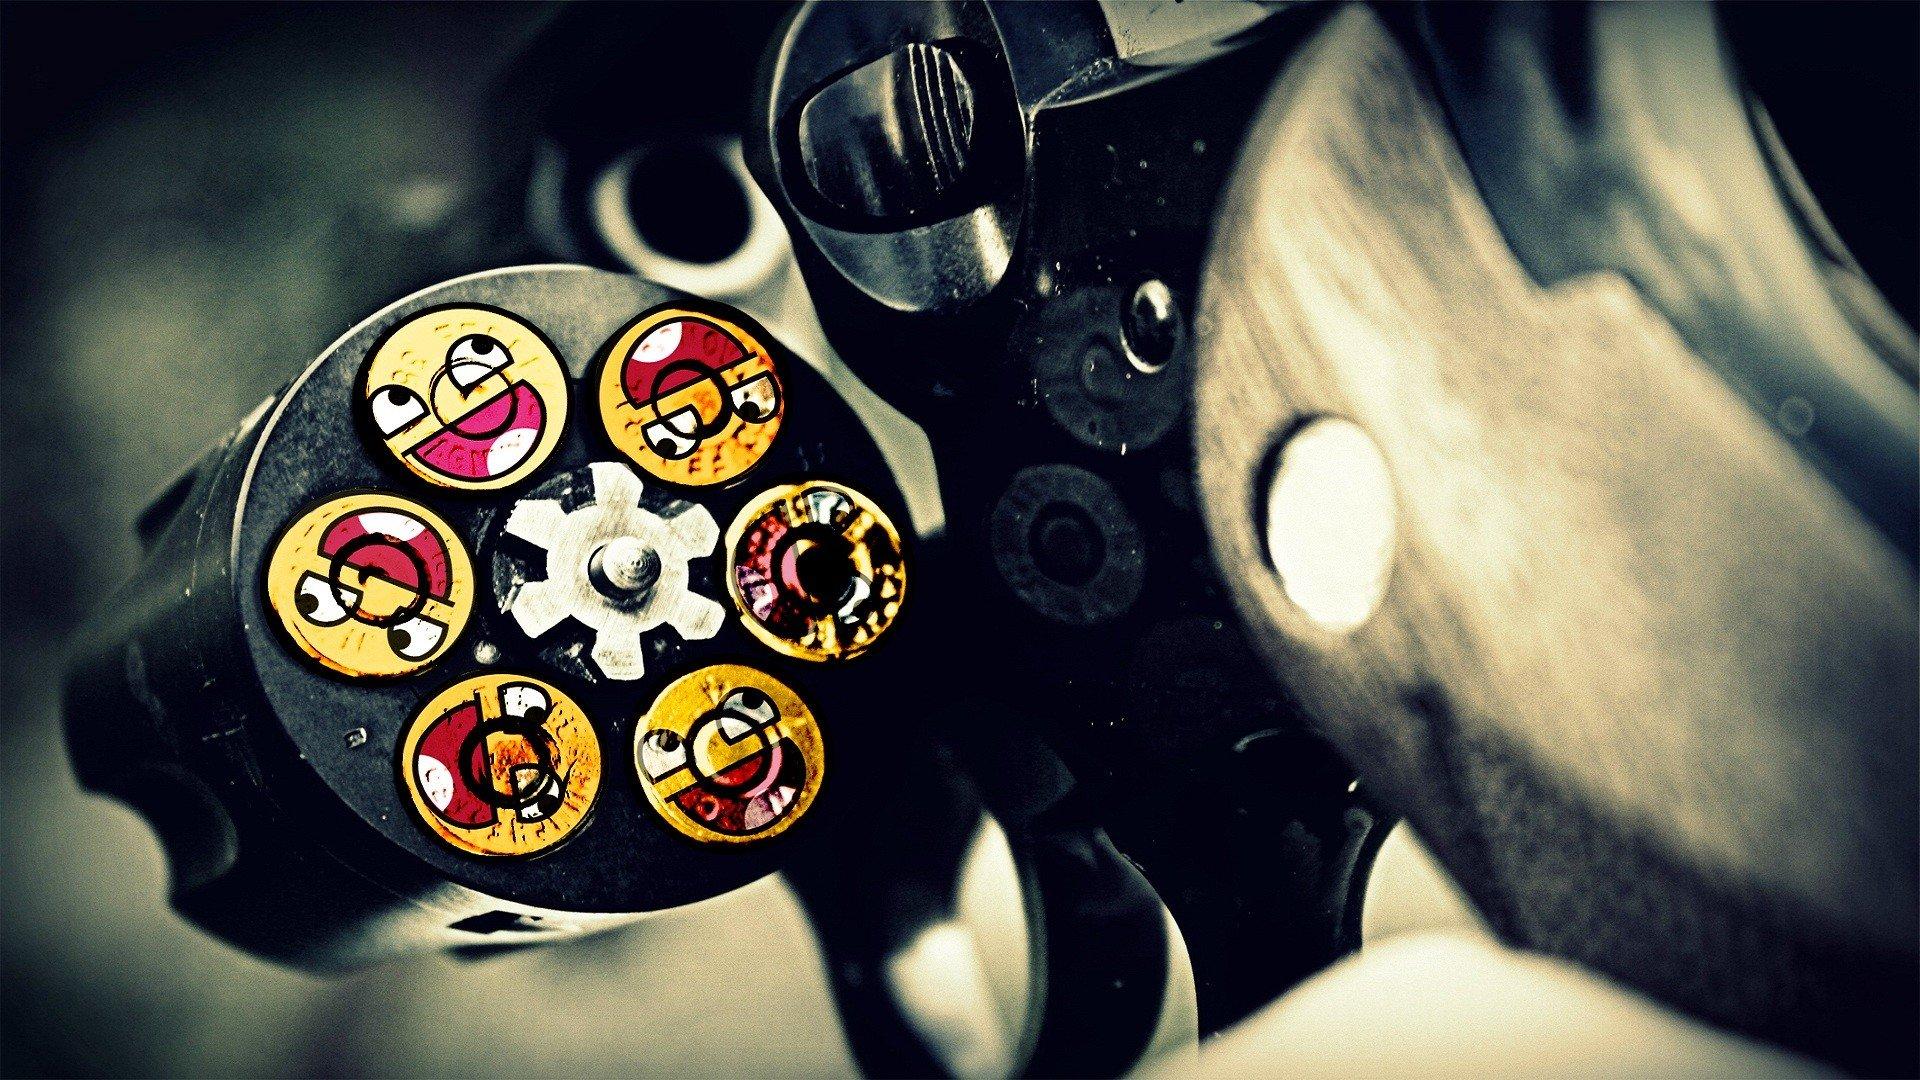 Guns ammunition smiley face Awesome Face wallpaper 1920x1080 1920x1080